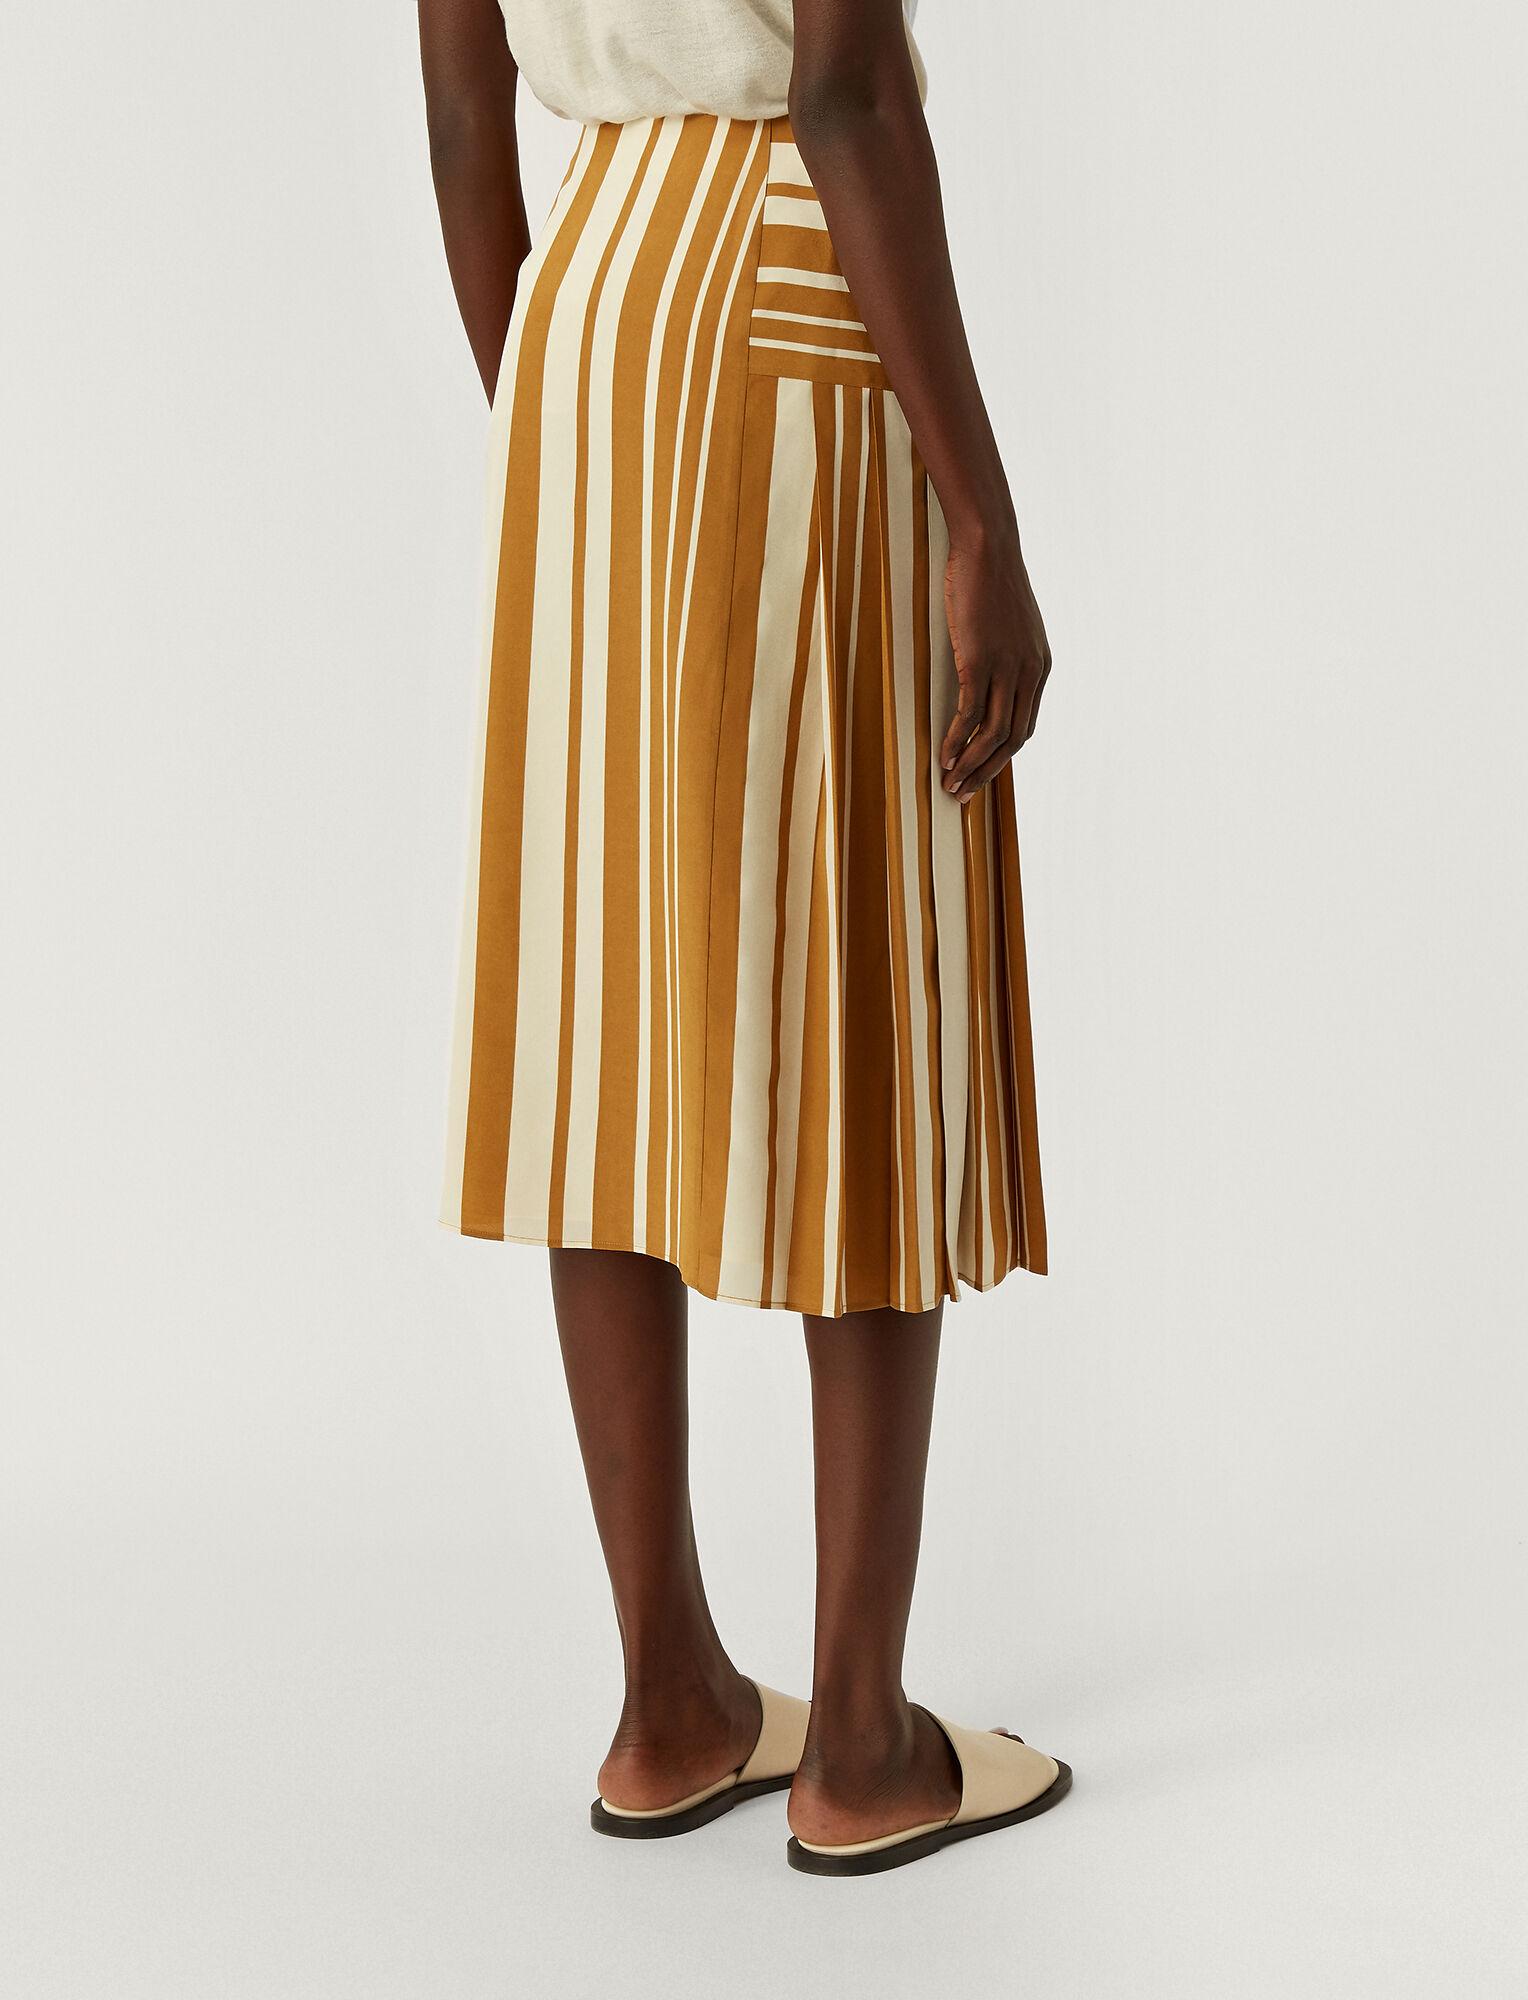 Joseph, Silk Stripes Swanson Skirt, in GREY/OCRE